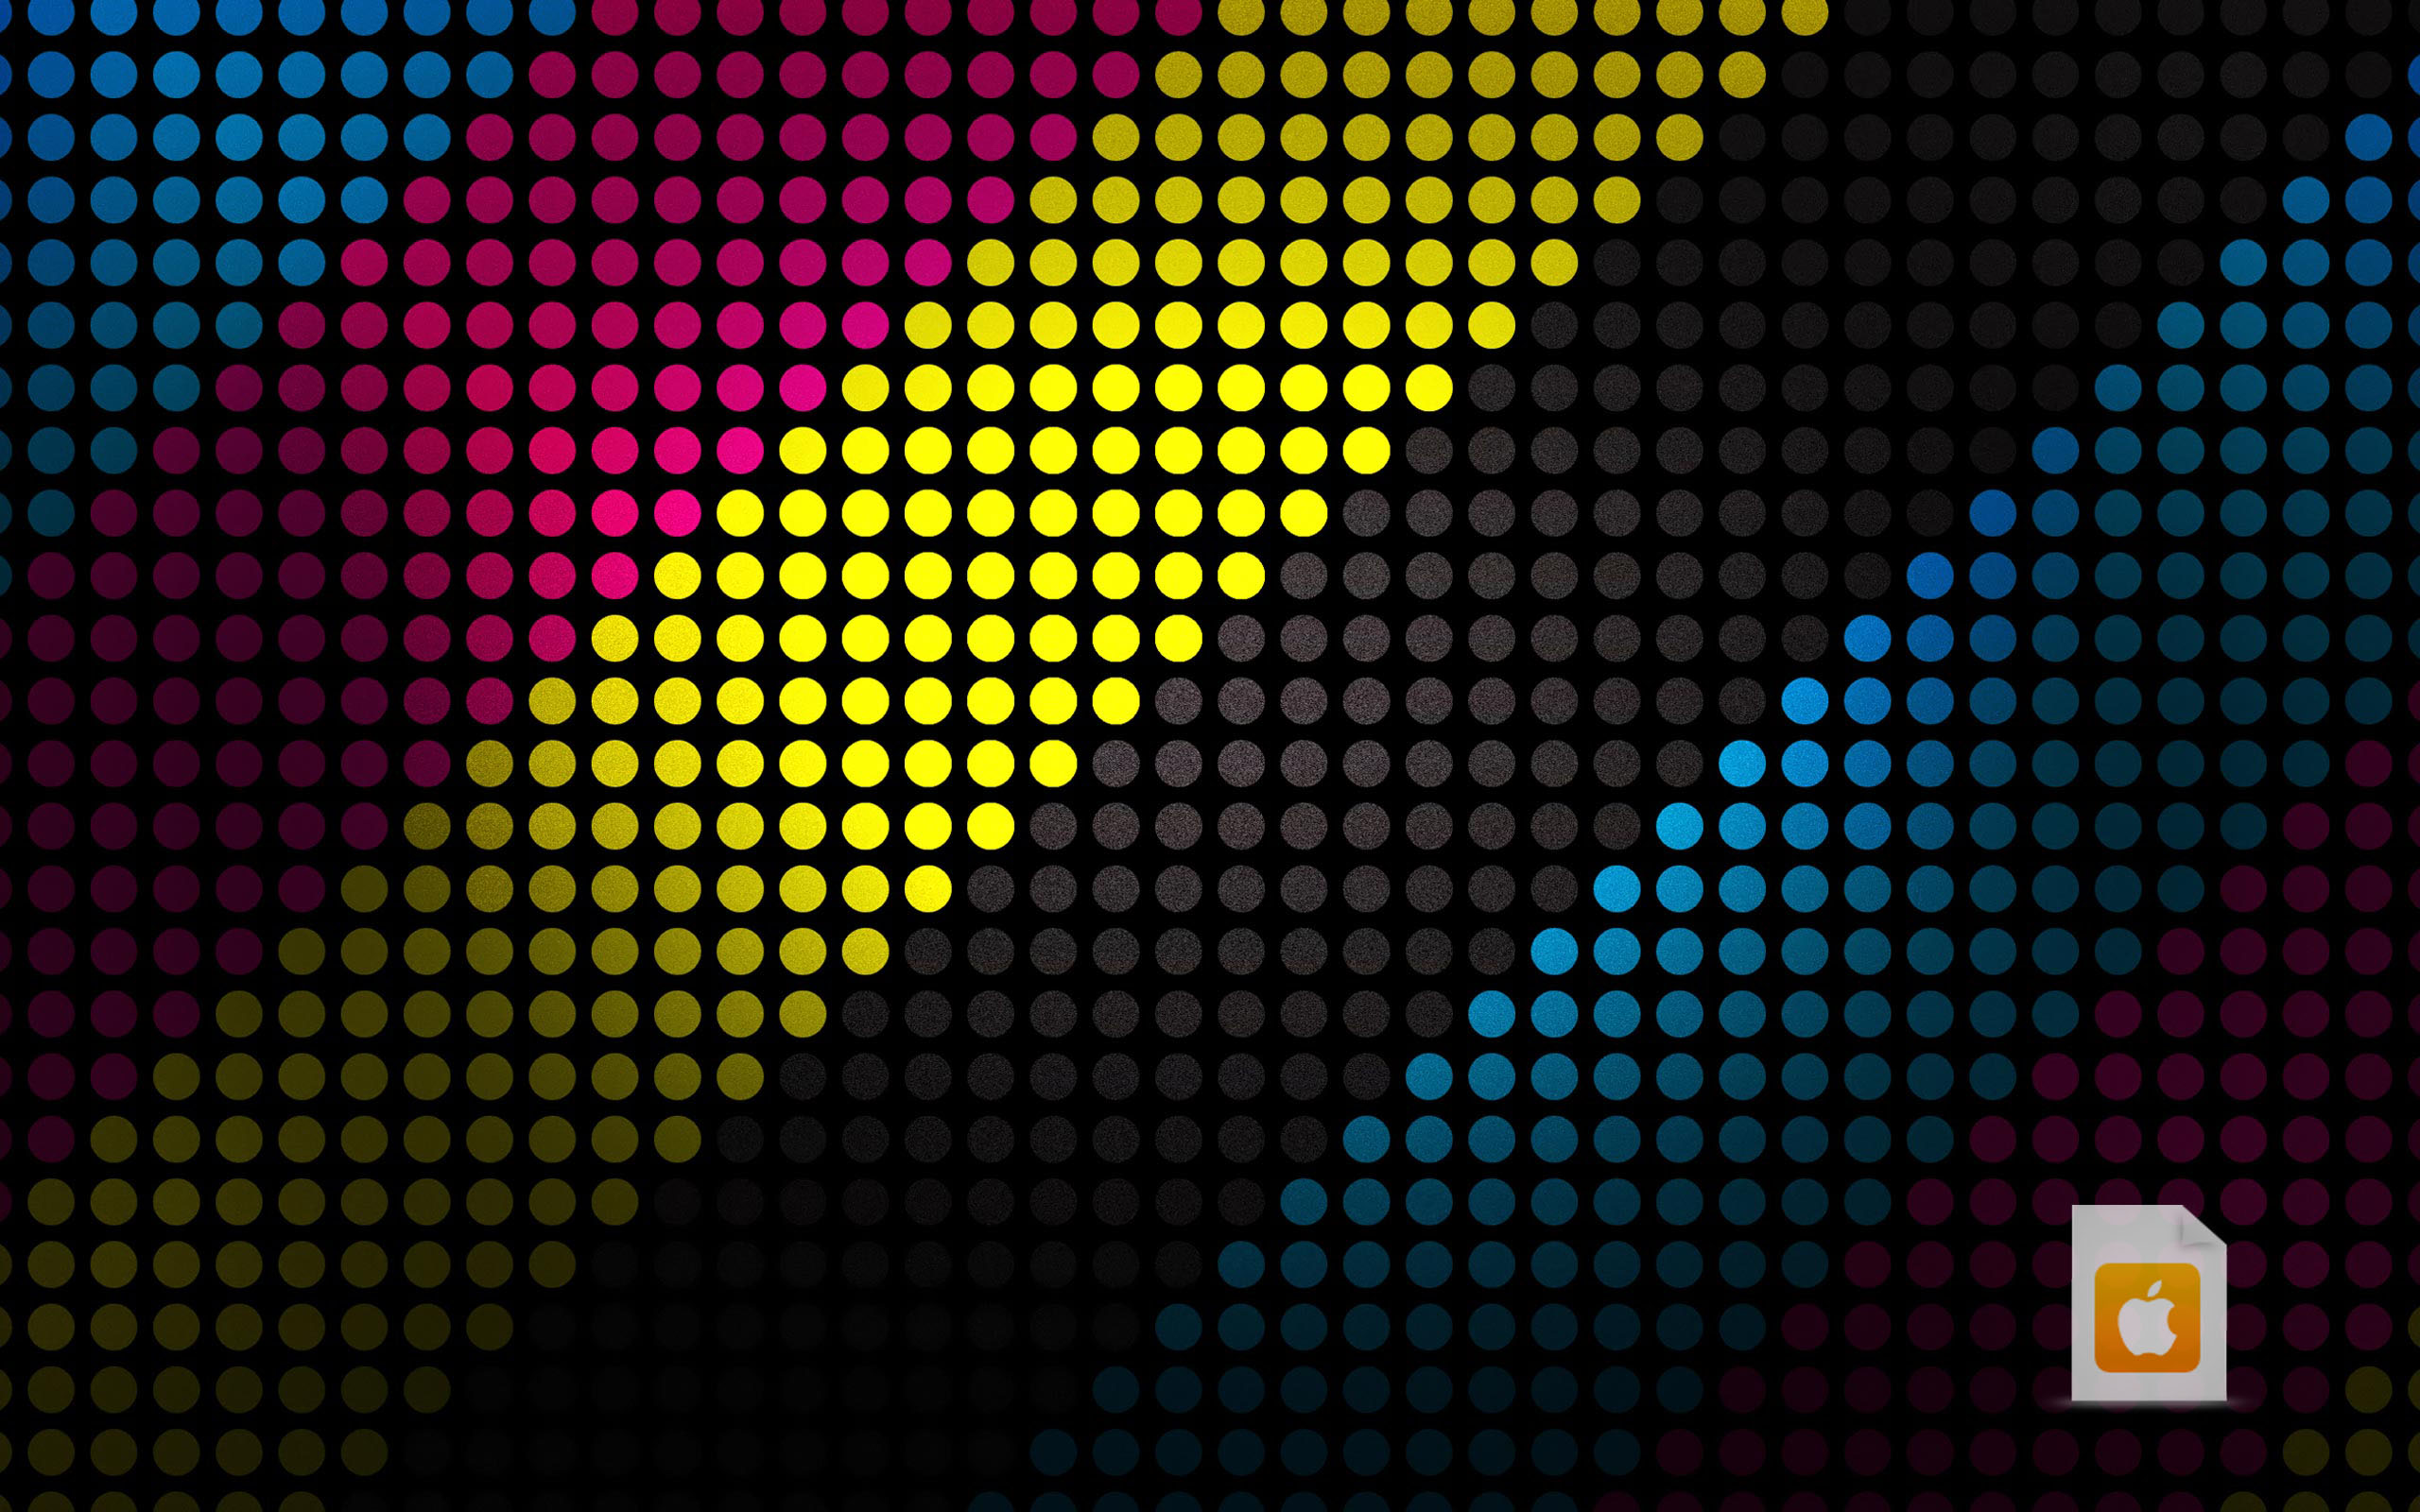 Hd Wallpaper For Pc On Wallpaperget 2560x1600 Download Hd Wallpaper Wallpapertip